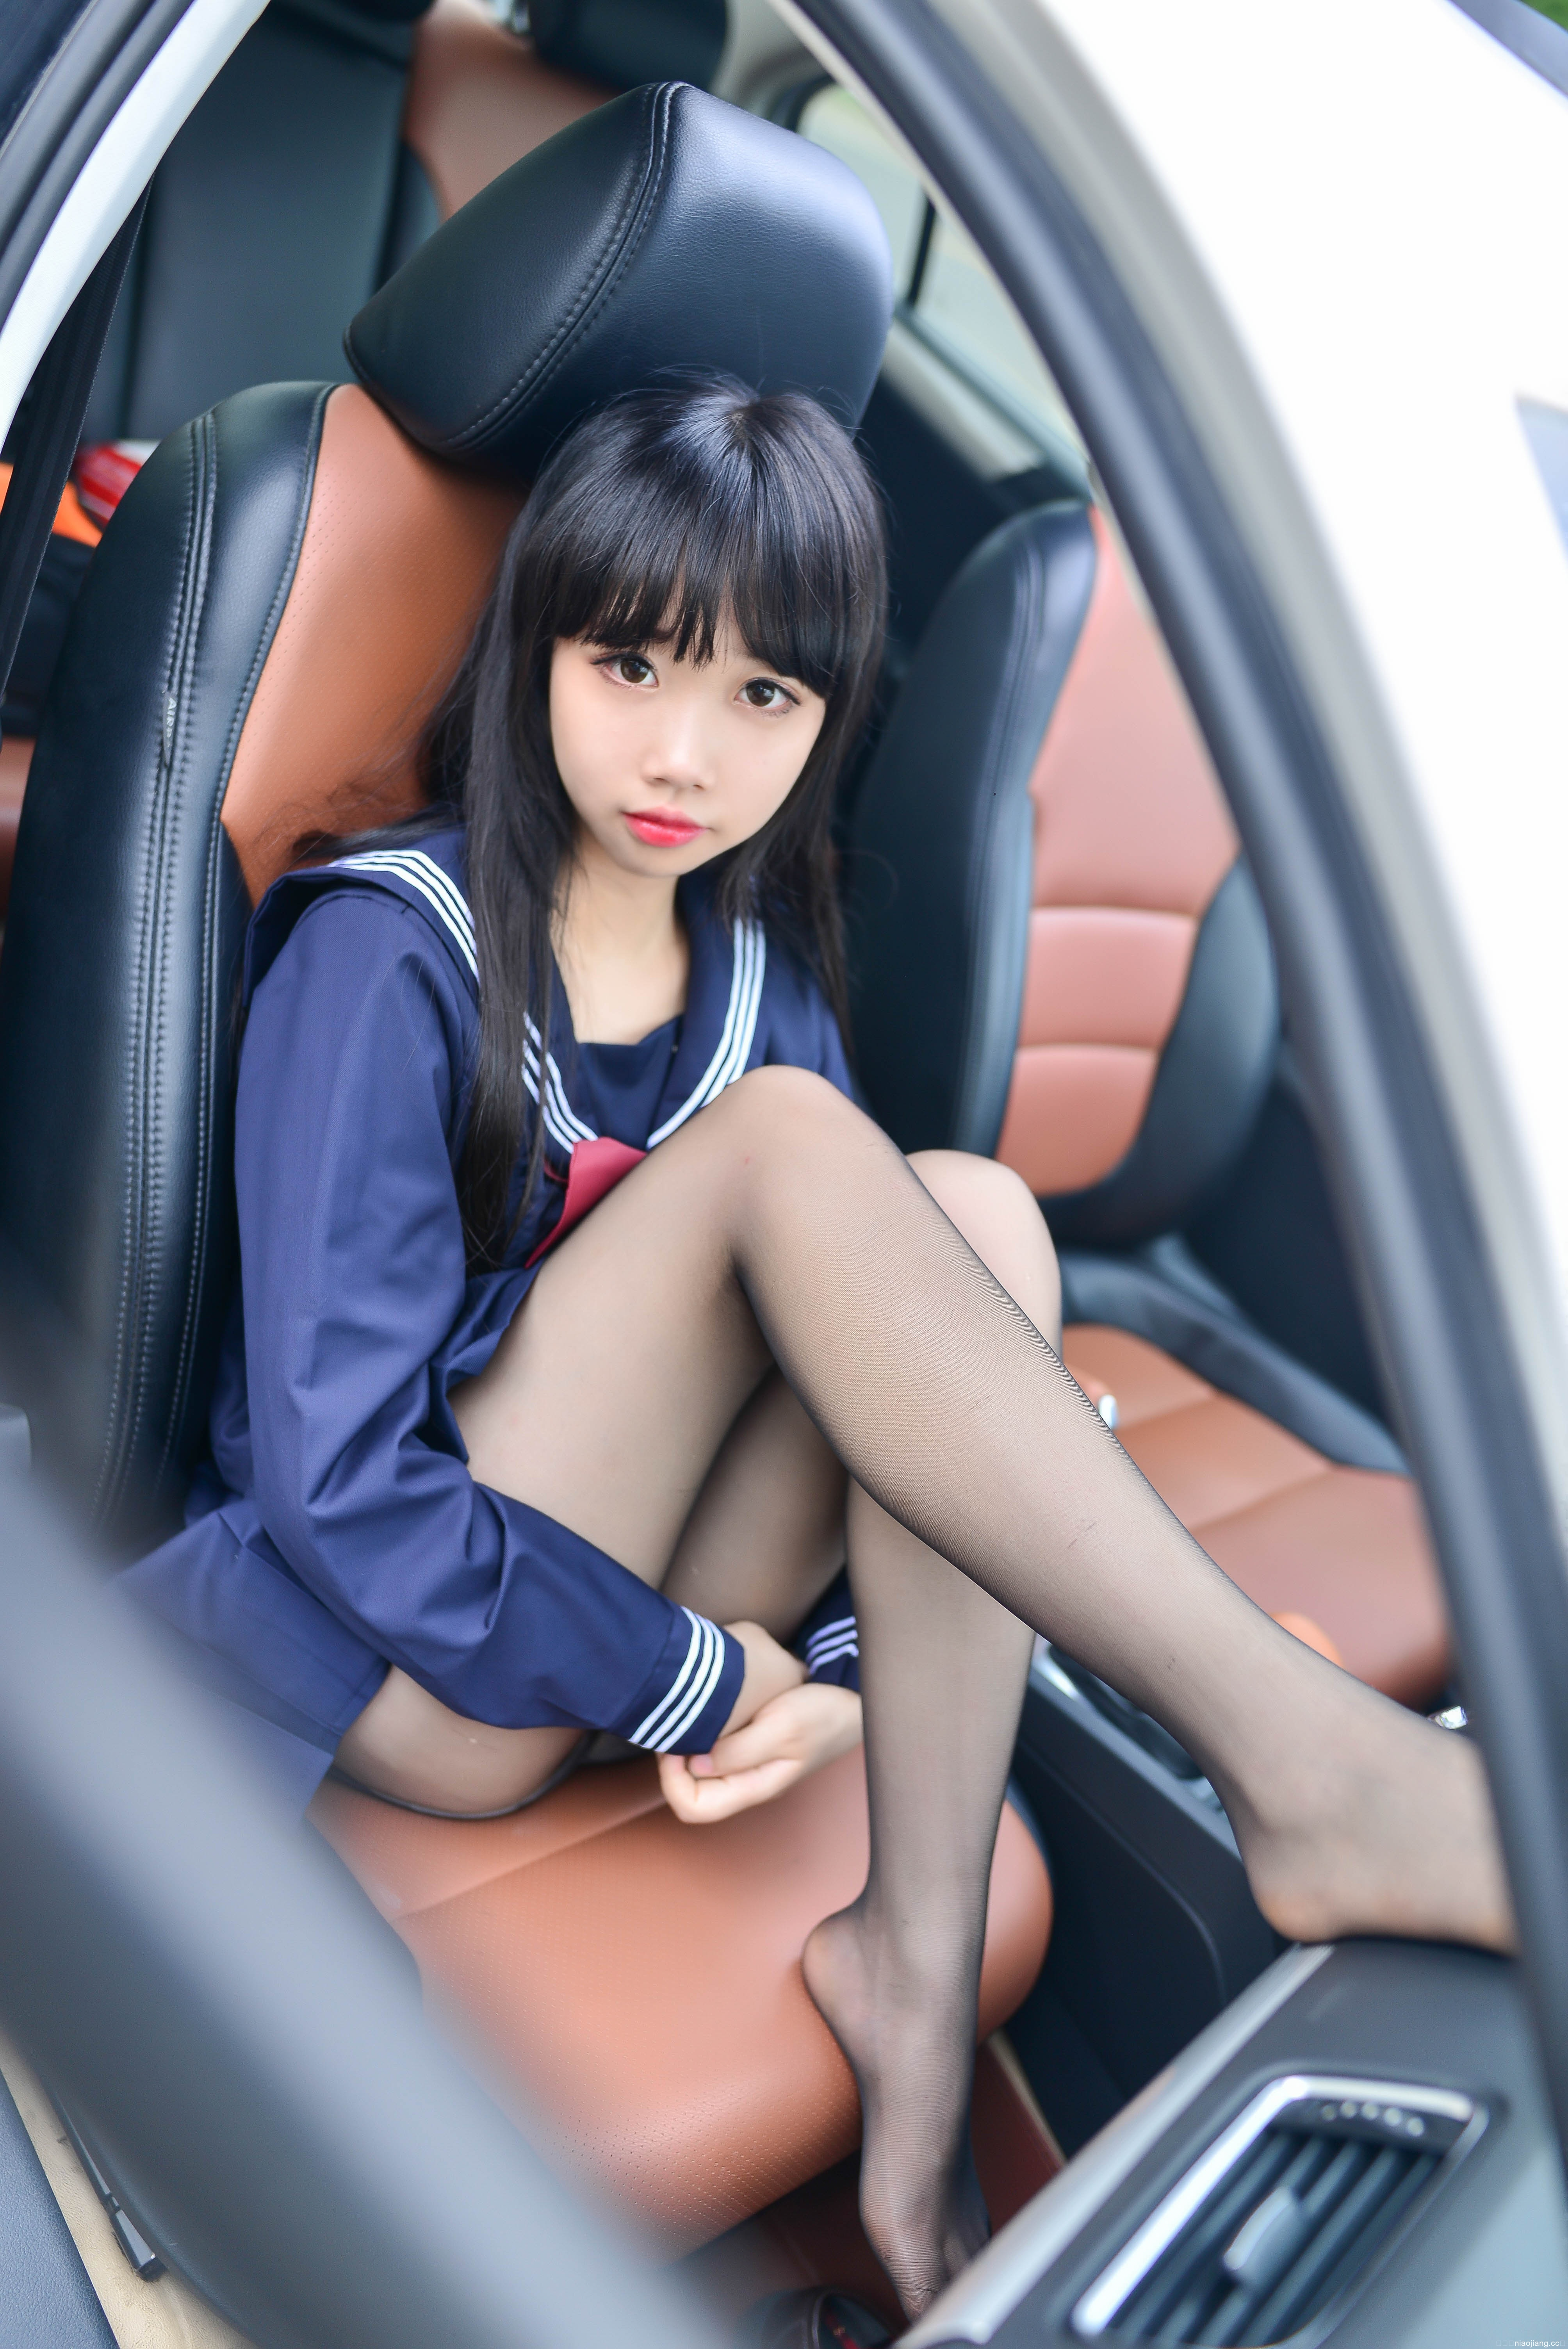 雪琪SAMA – 车内JK [20P93M]